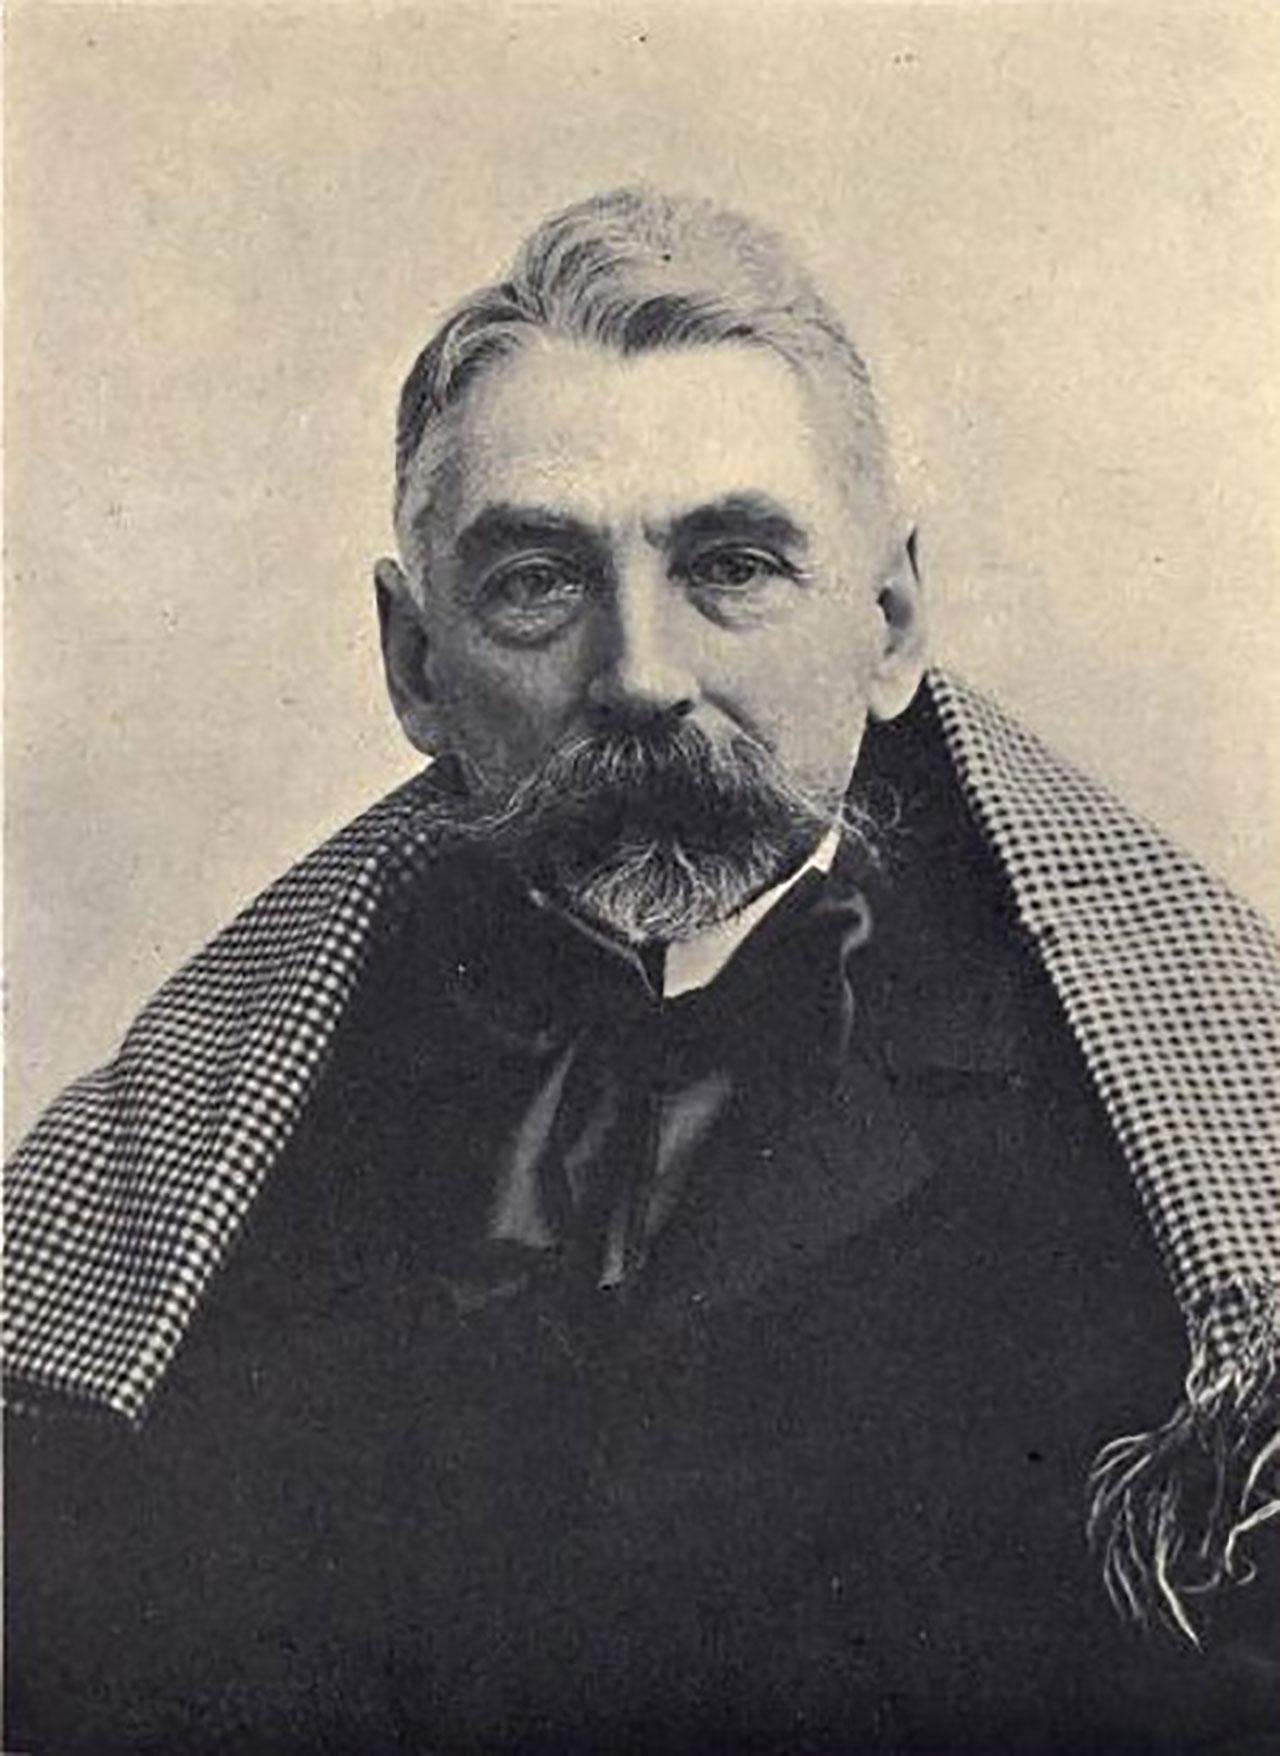 Stéphane Mallarmé (ステファヌ・マラルメ)